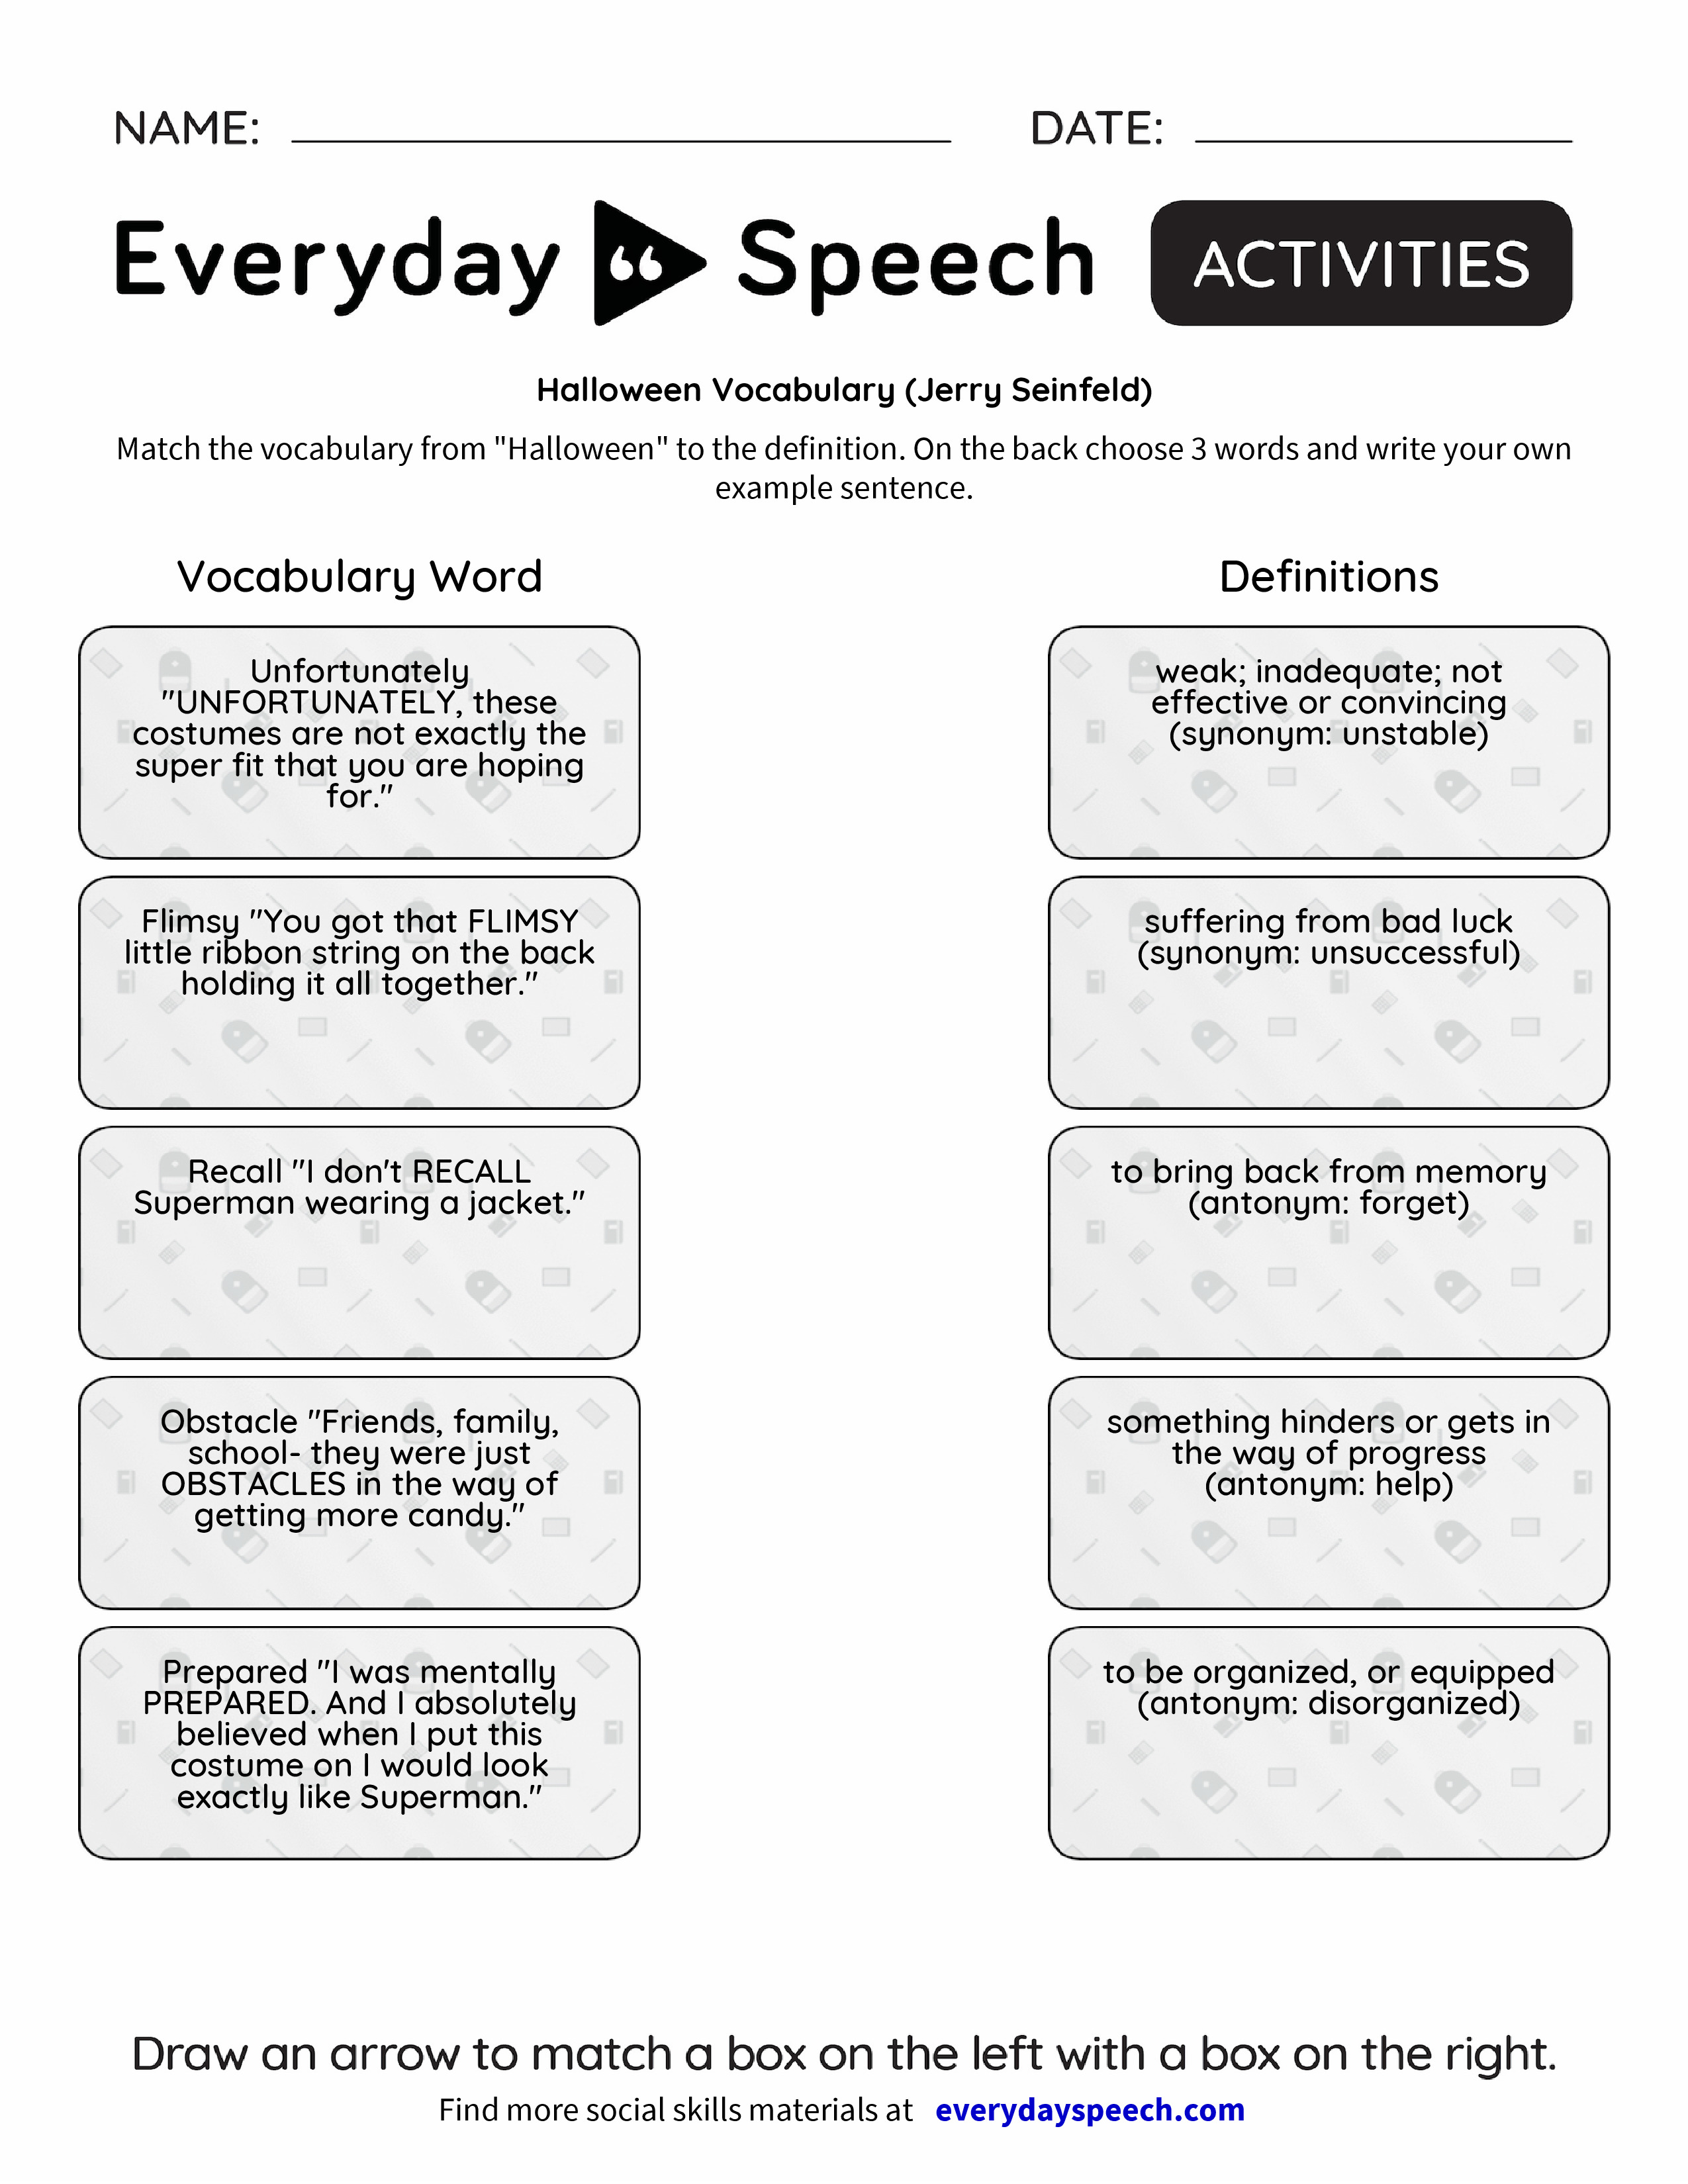 Everyday Speech